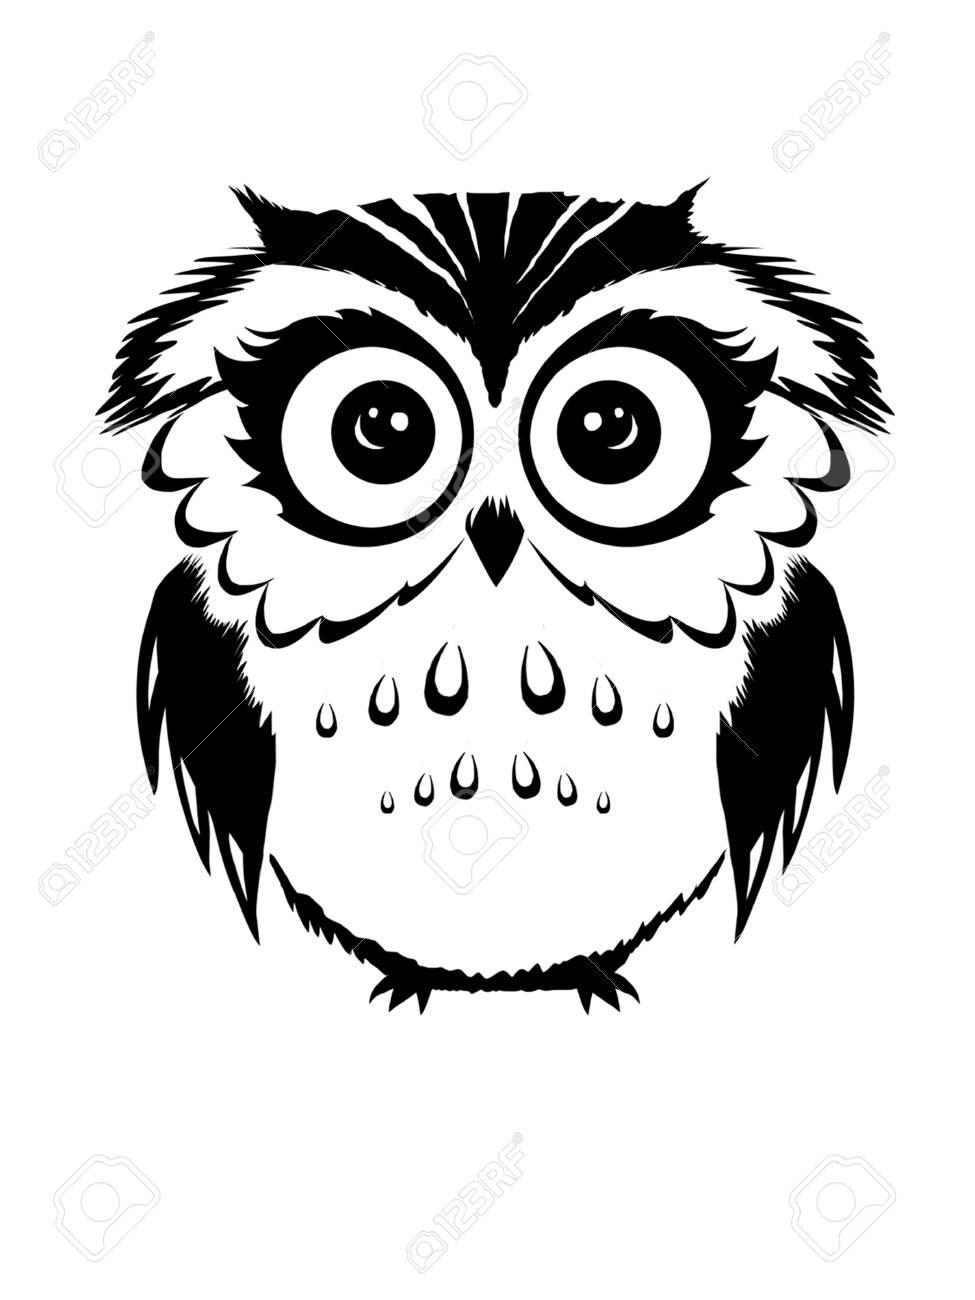 cute Owl black and white.